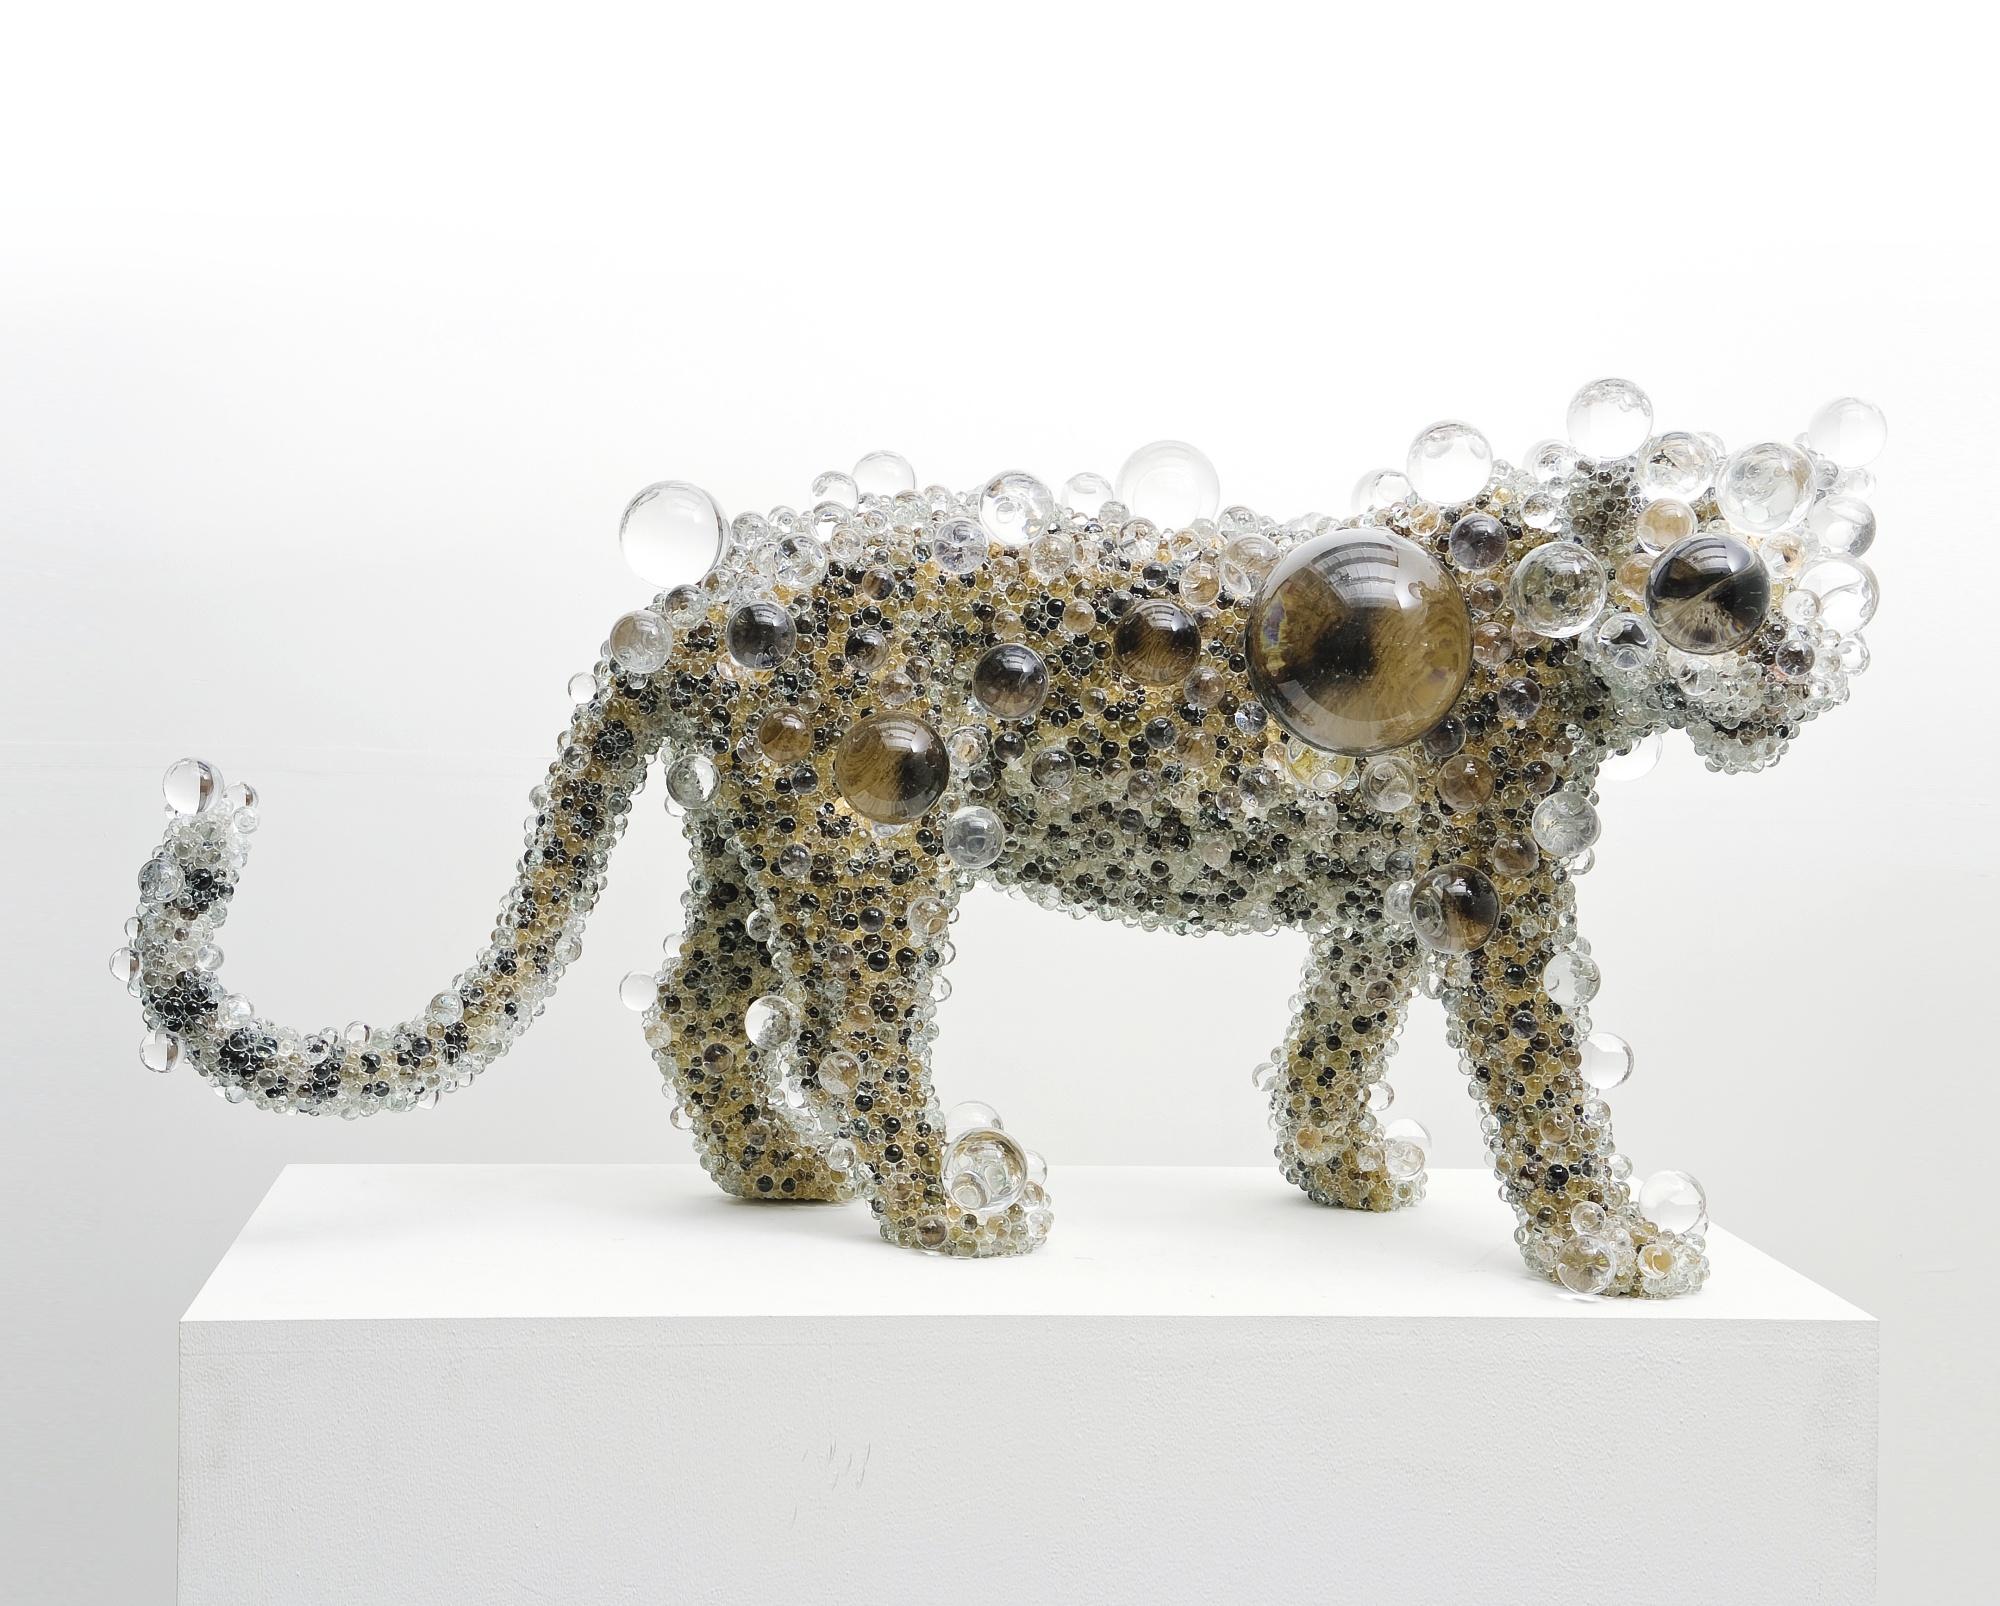 Kohei Nawa-Pixcell-Model-Leopard-2009